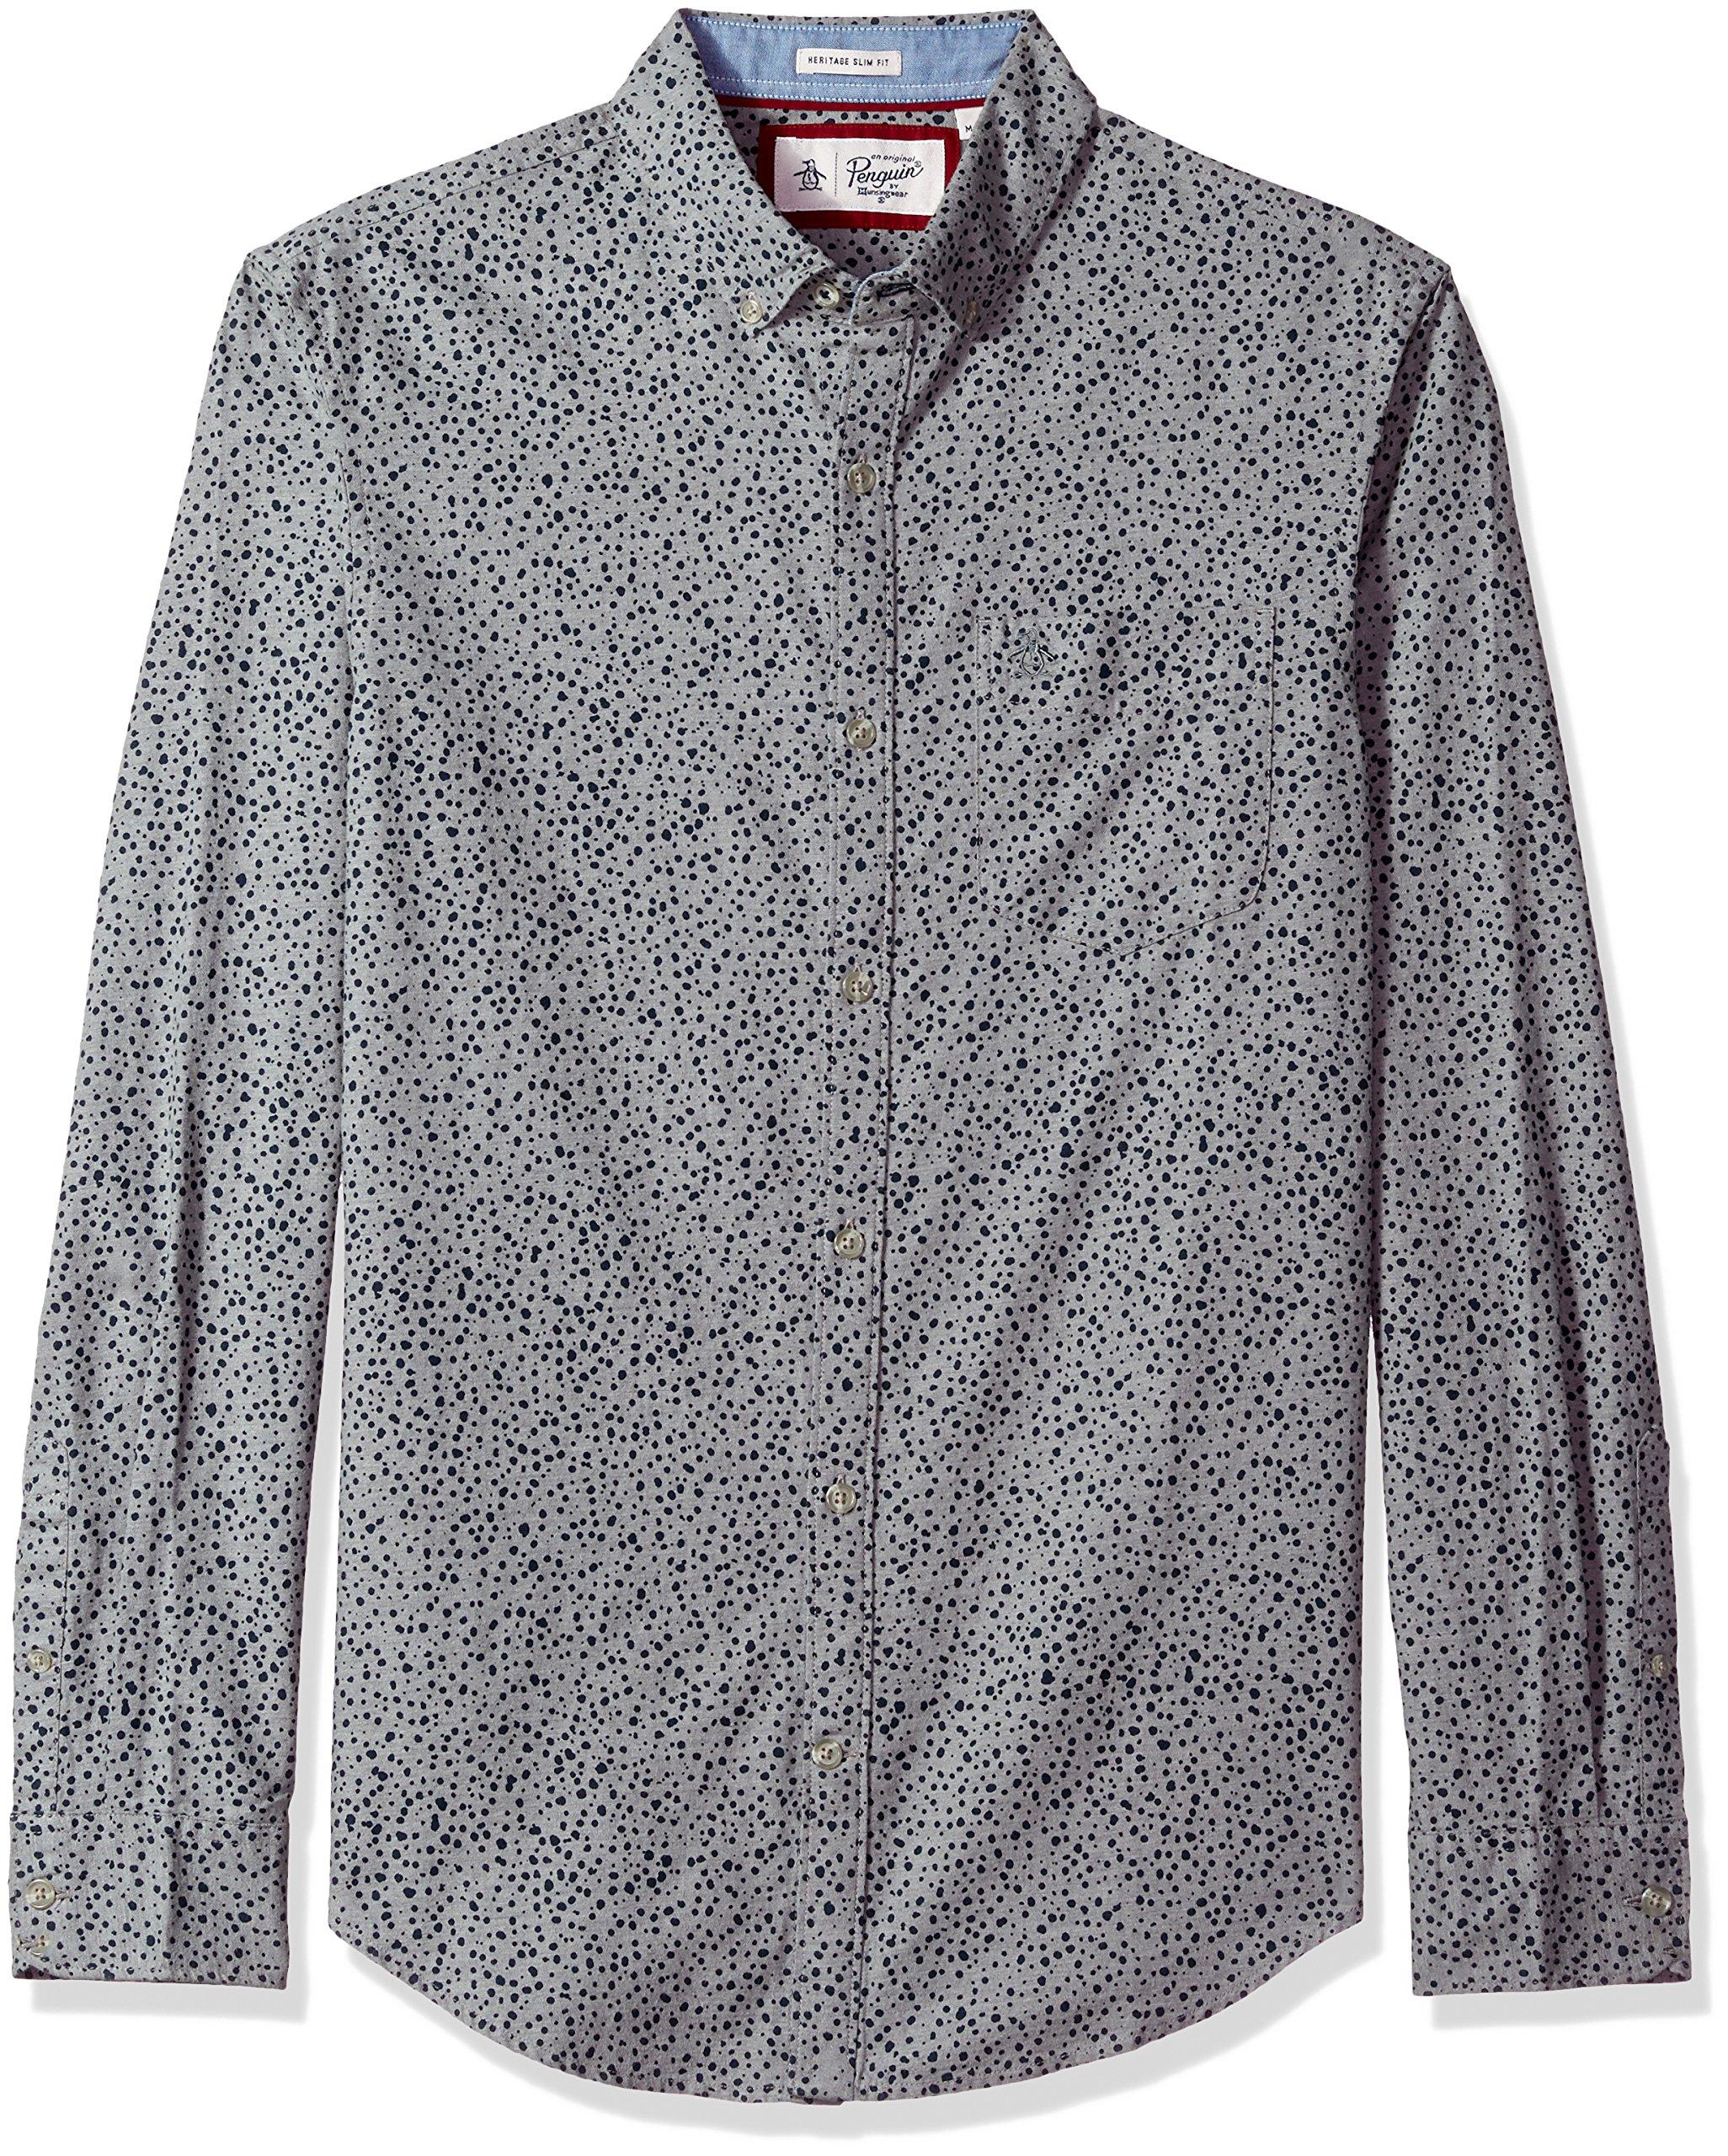 Original Penguin Men's Scattered Drop Shirt, Rain Heather, Large